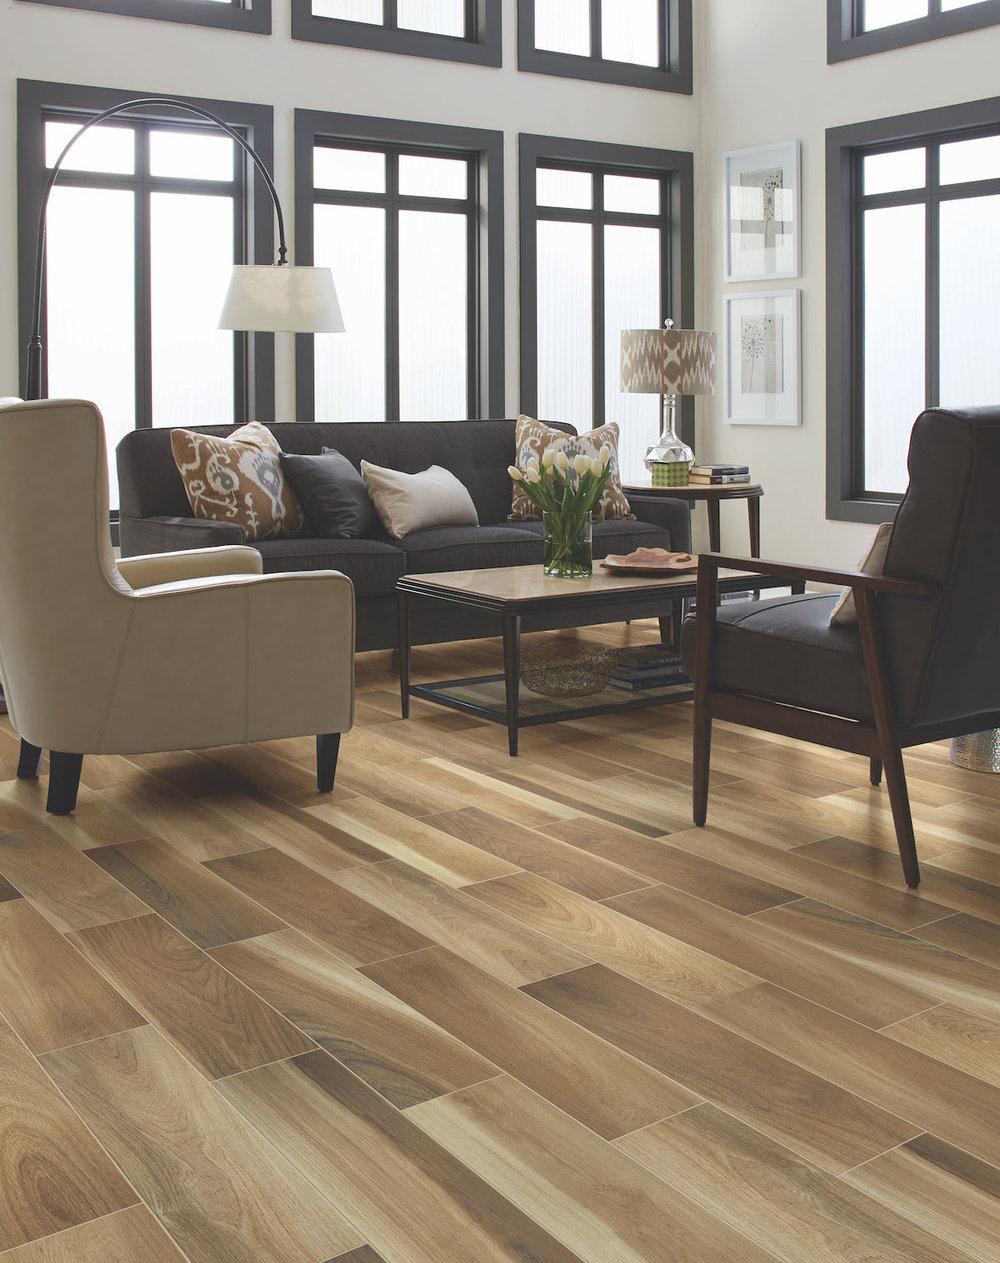 wood look tile — Acadian Flooring Design Center